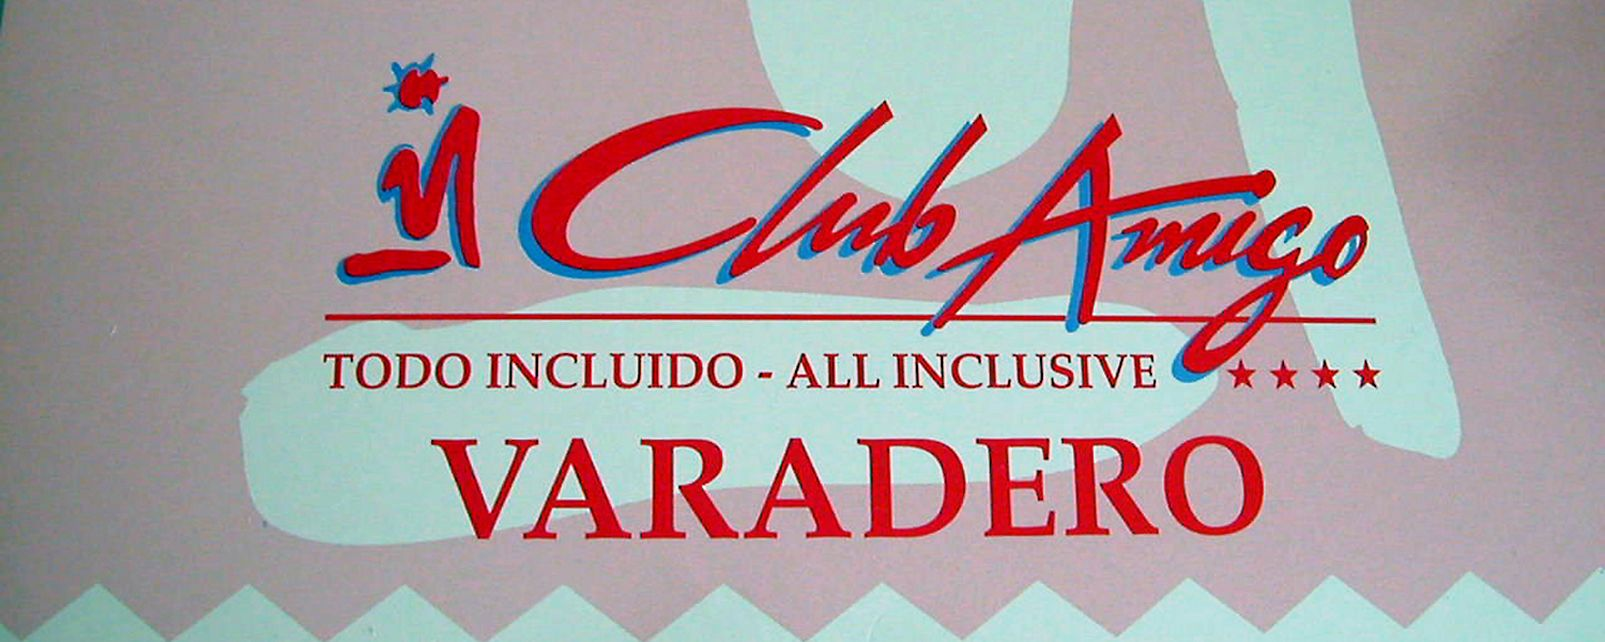 Hotel Club Amigo